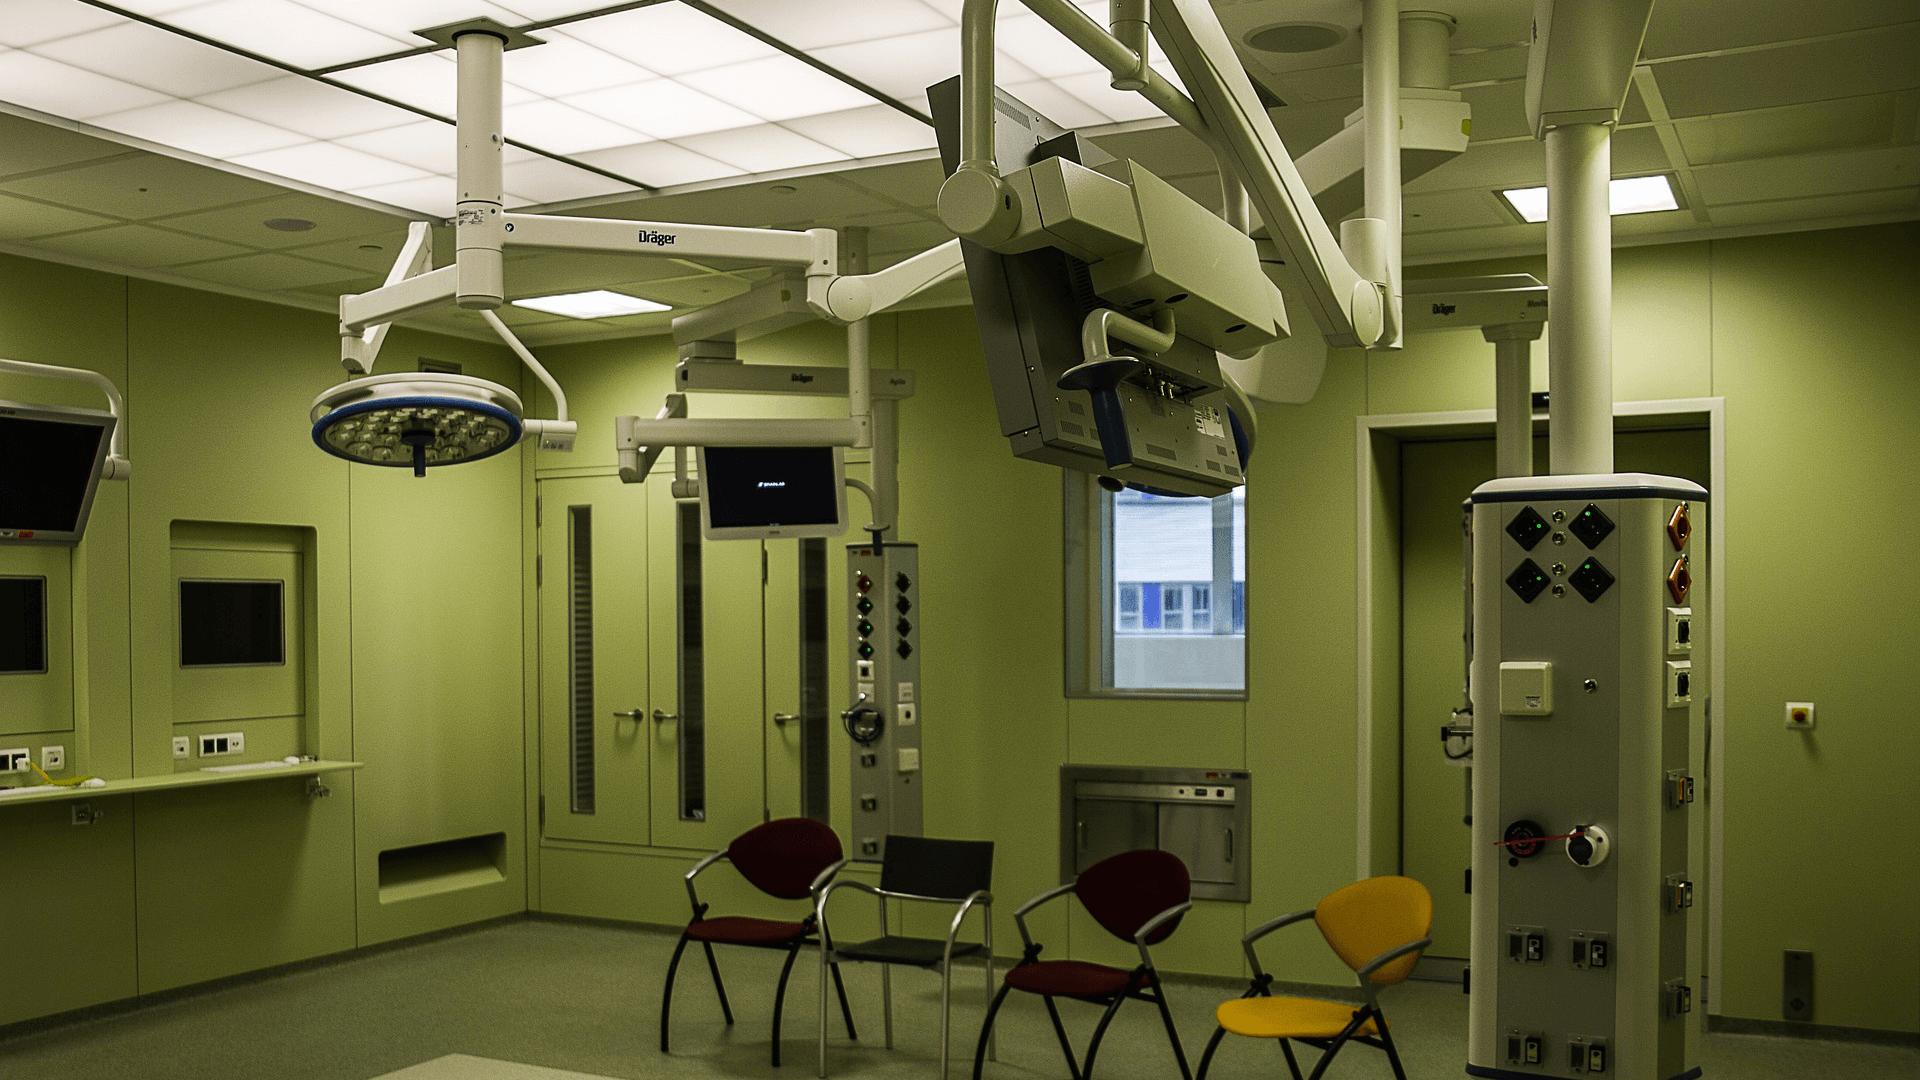 StatMed Hospital Image